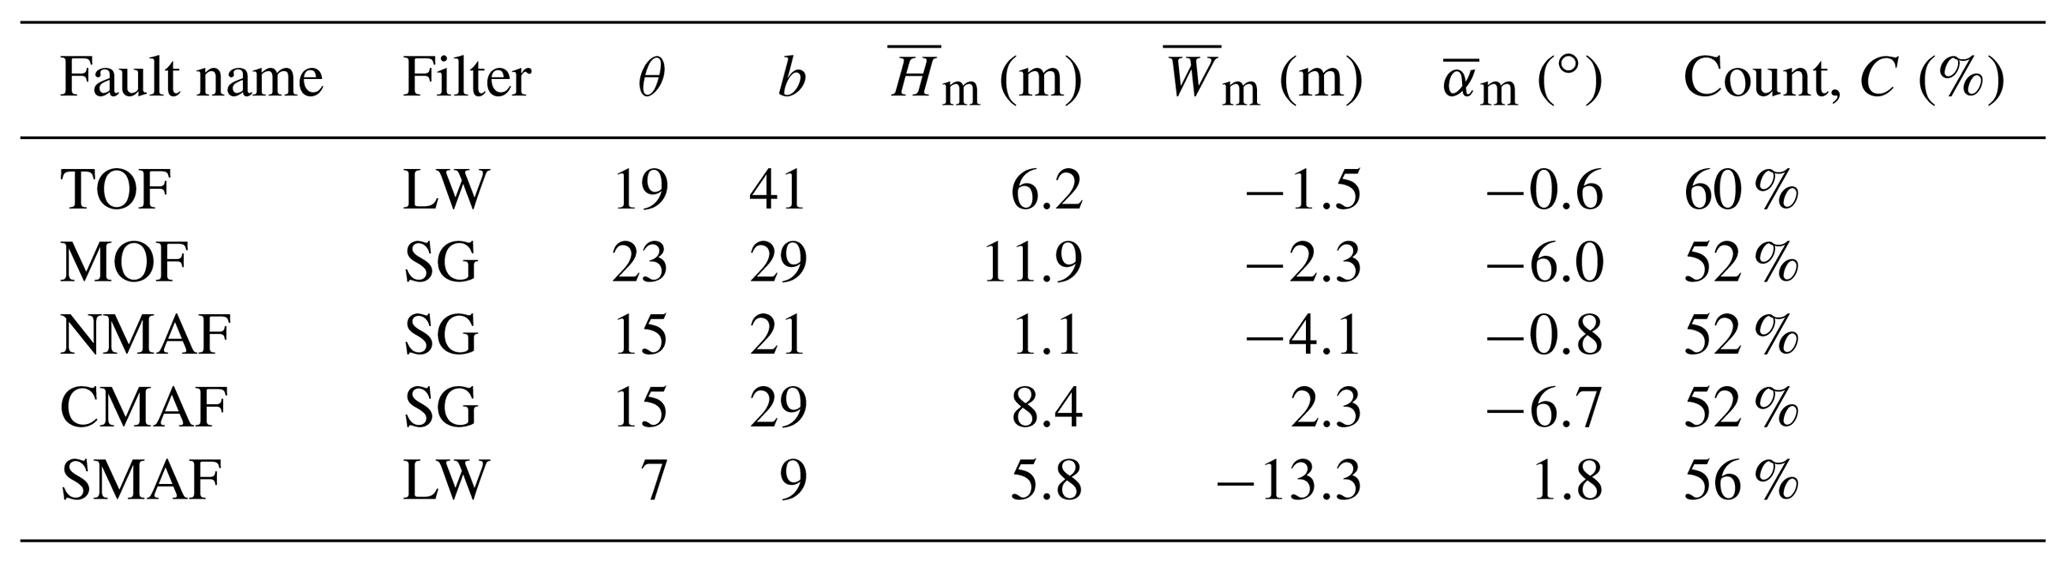 SE - A semi-automated algorithm to quantify scarp morphology